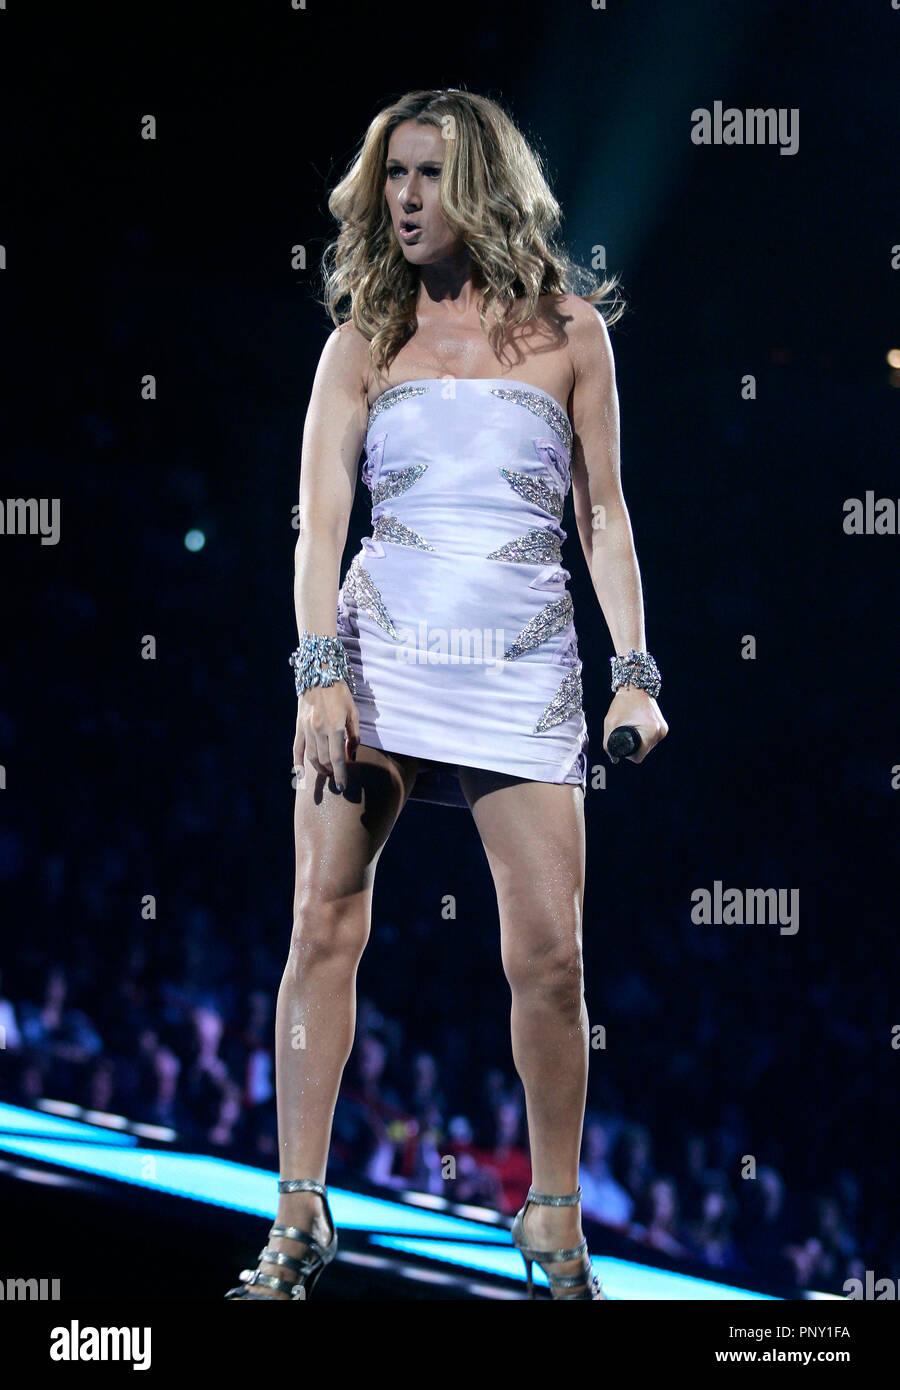 Celine Dion Performs In Concert Stock Photos Amp Celine Dion